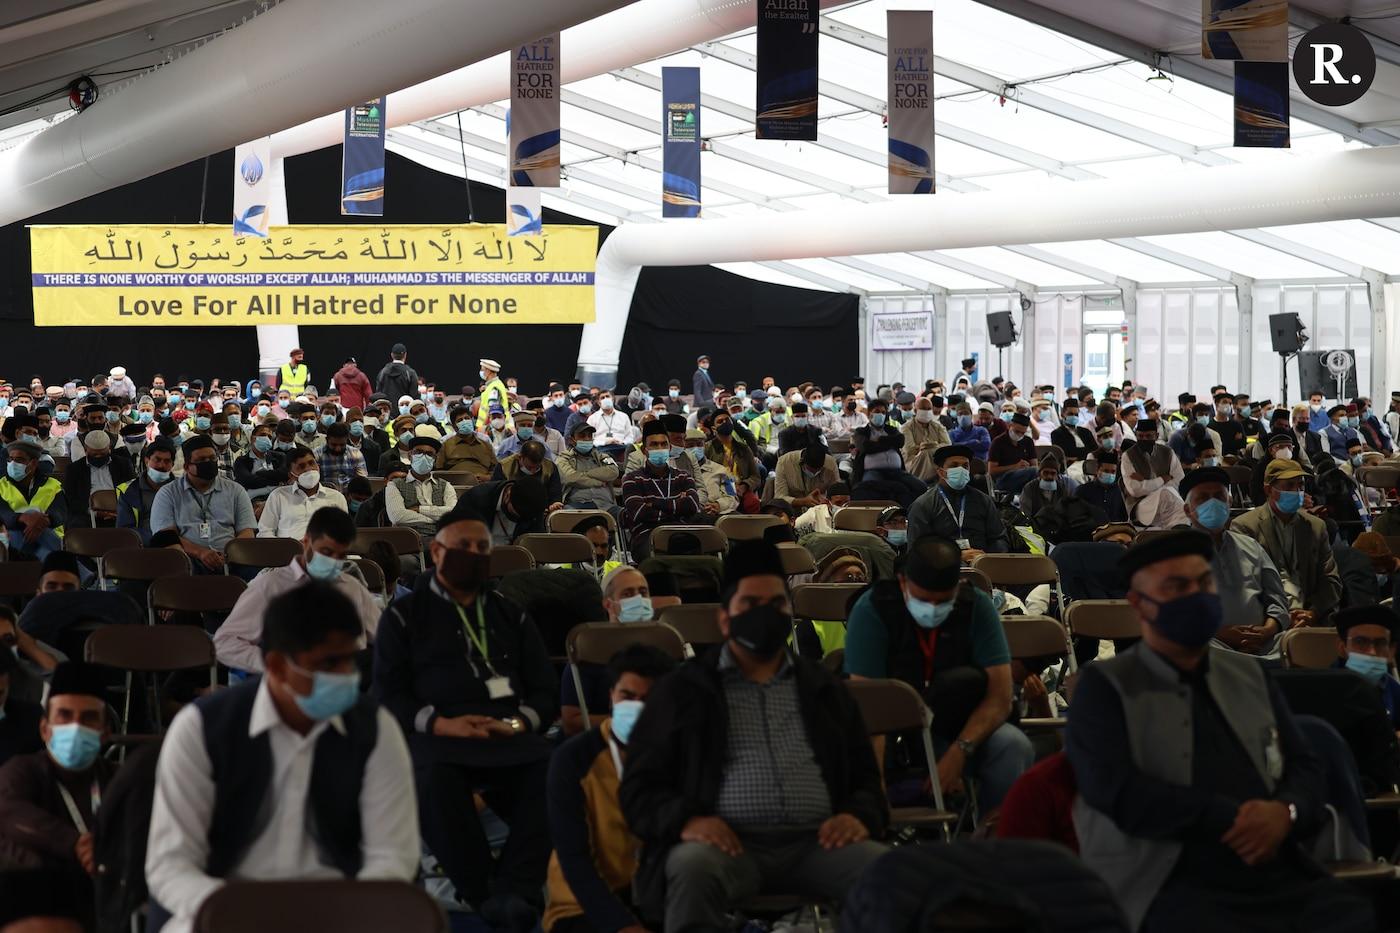 How Do German Ahmadis Feel About Attending Jalsa Salana UK 2021 from Afar?